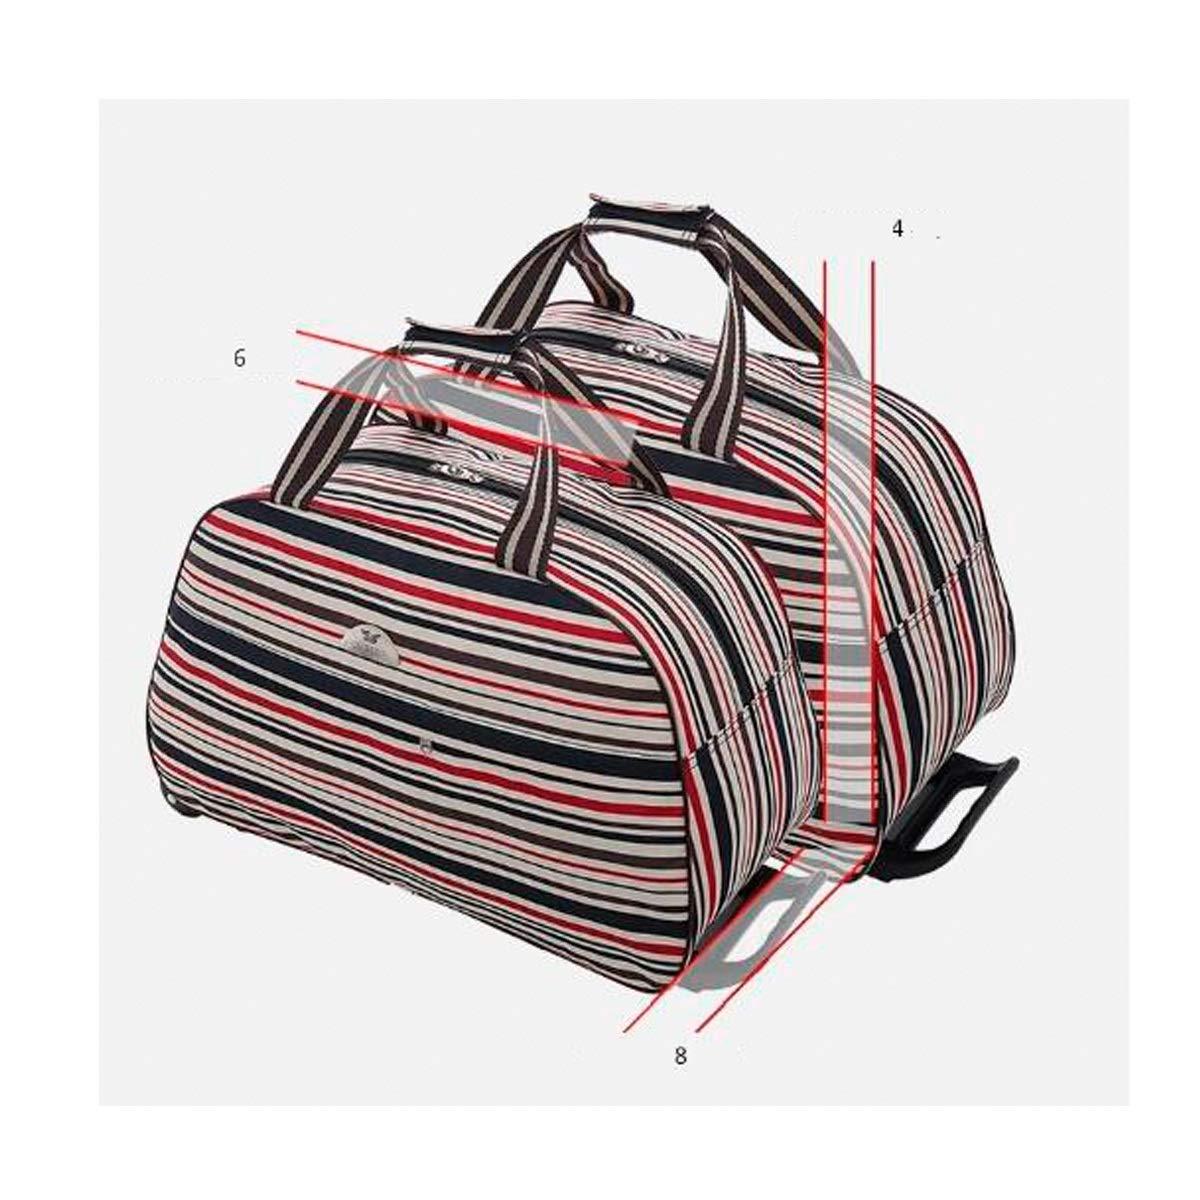 Bahaowenjuguan Trolley case Suitcase,Handbag Soft Bag 20 inches Color : Colored Petals, Size : 20 Travel case Travel Storage Bag